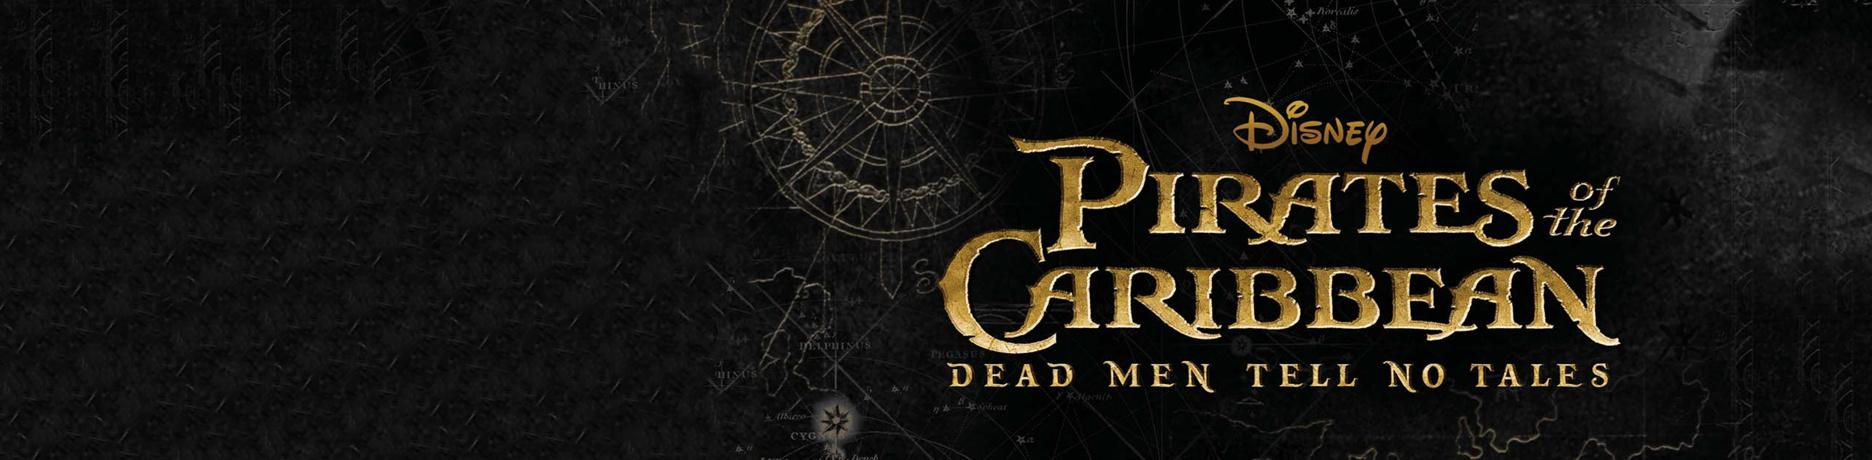 Pirates of the Carrribean